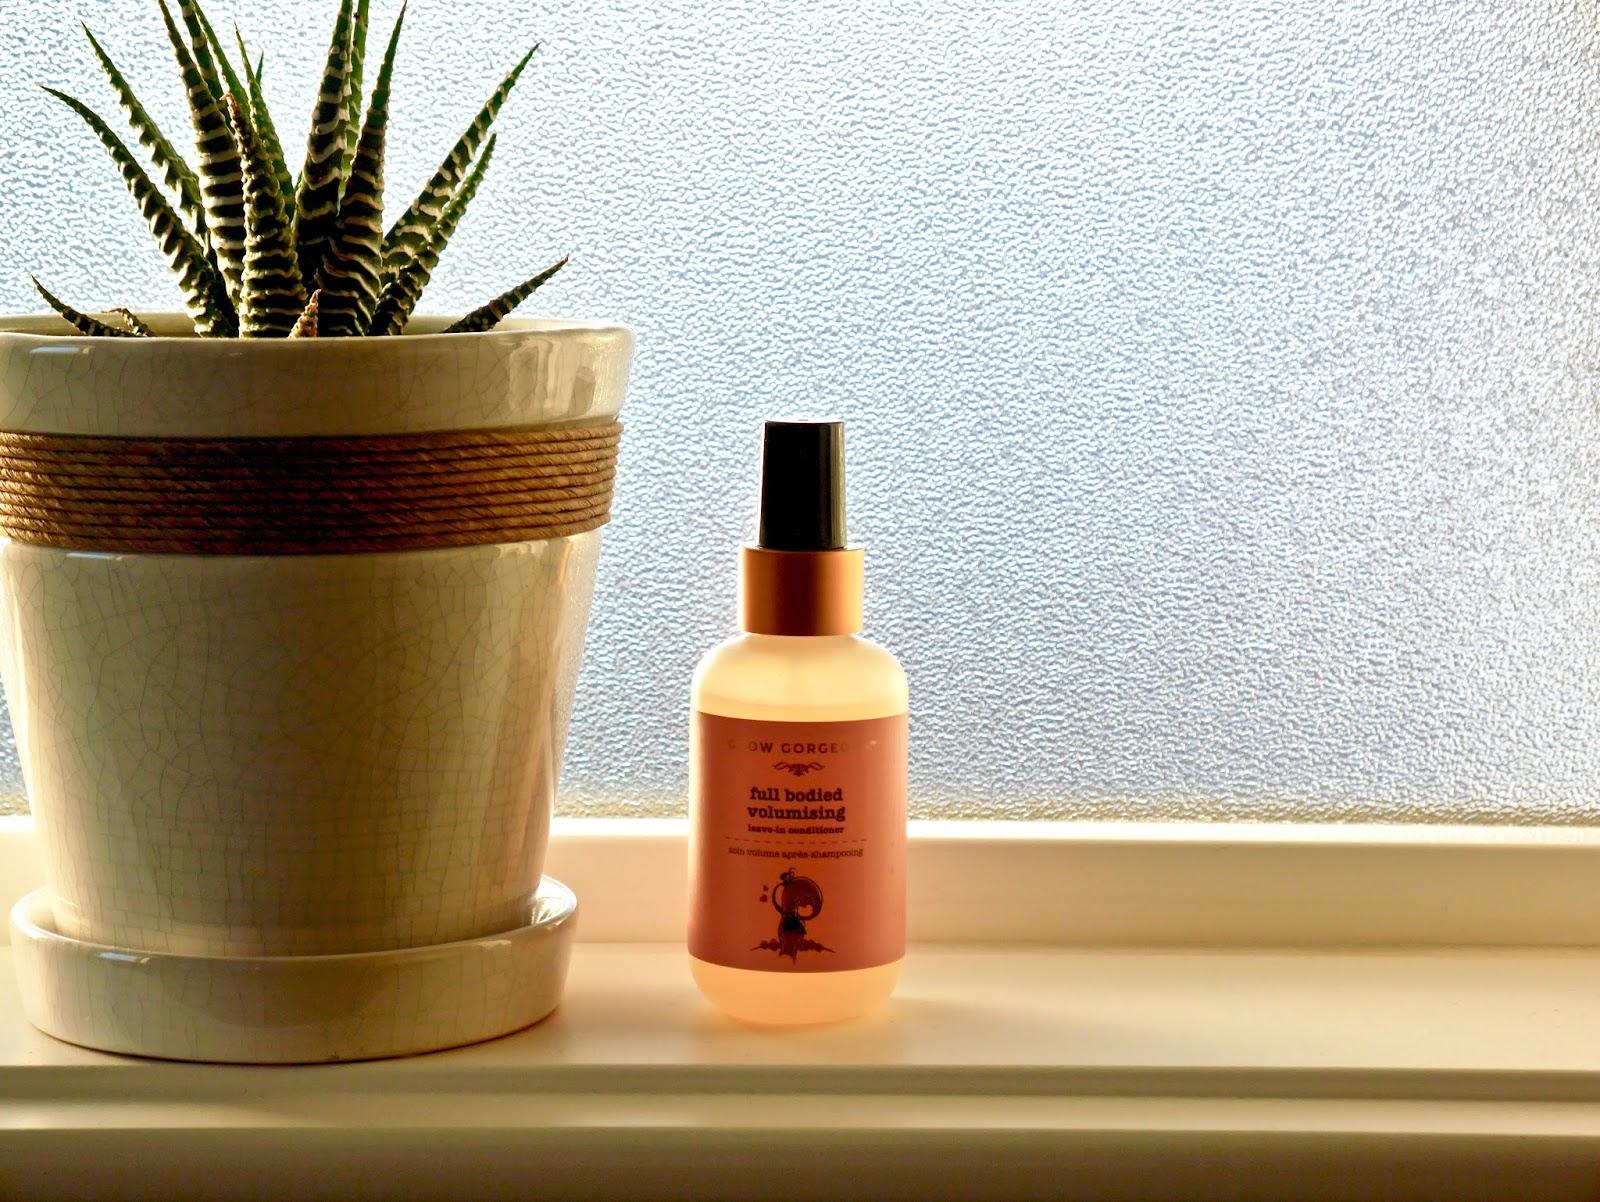 haircare, shampoo, conditioner, hair treatment, hair serum, beauty, Canadian beauty